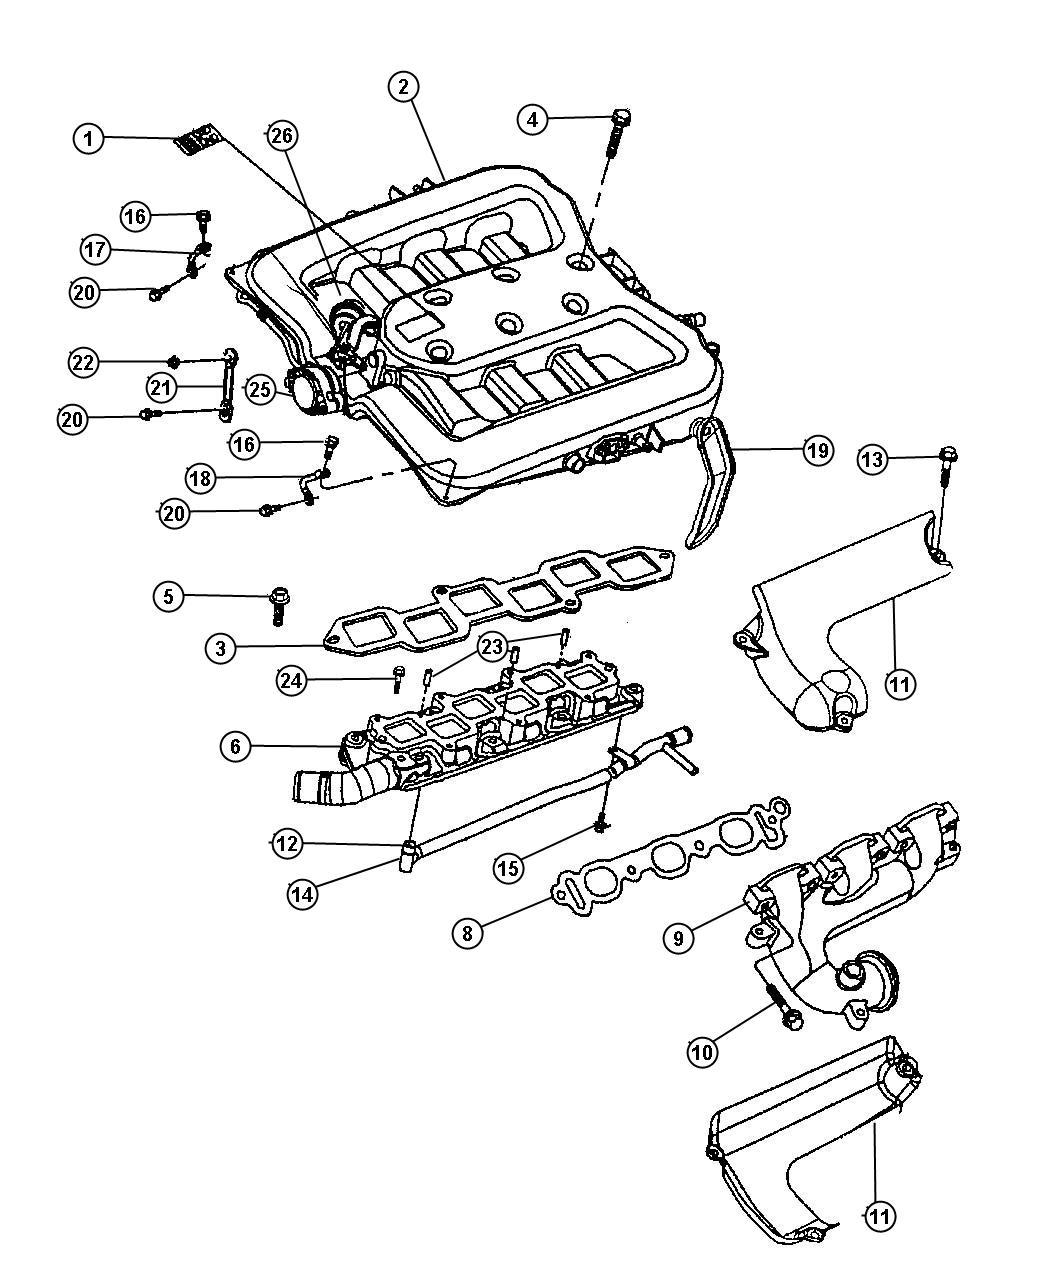 2000 Chrysler Concorde Shield  Exhaust Manifold  Upper